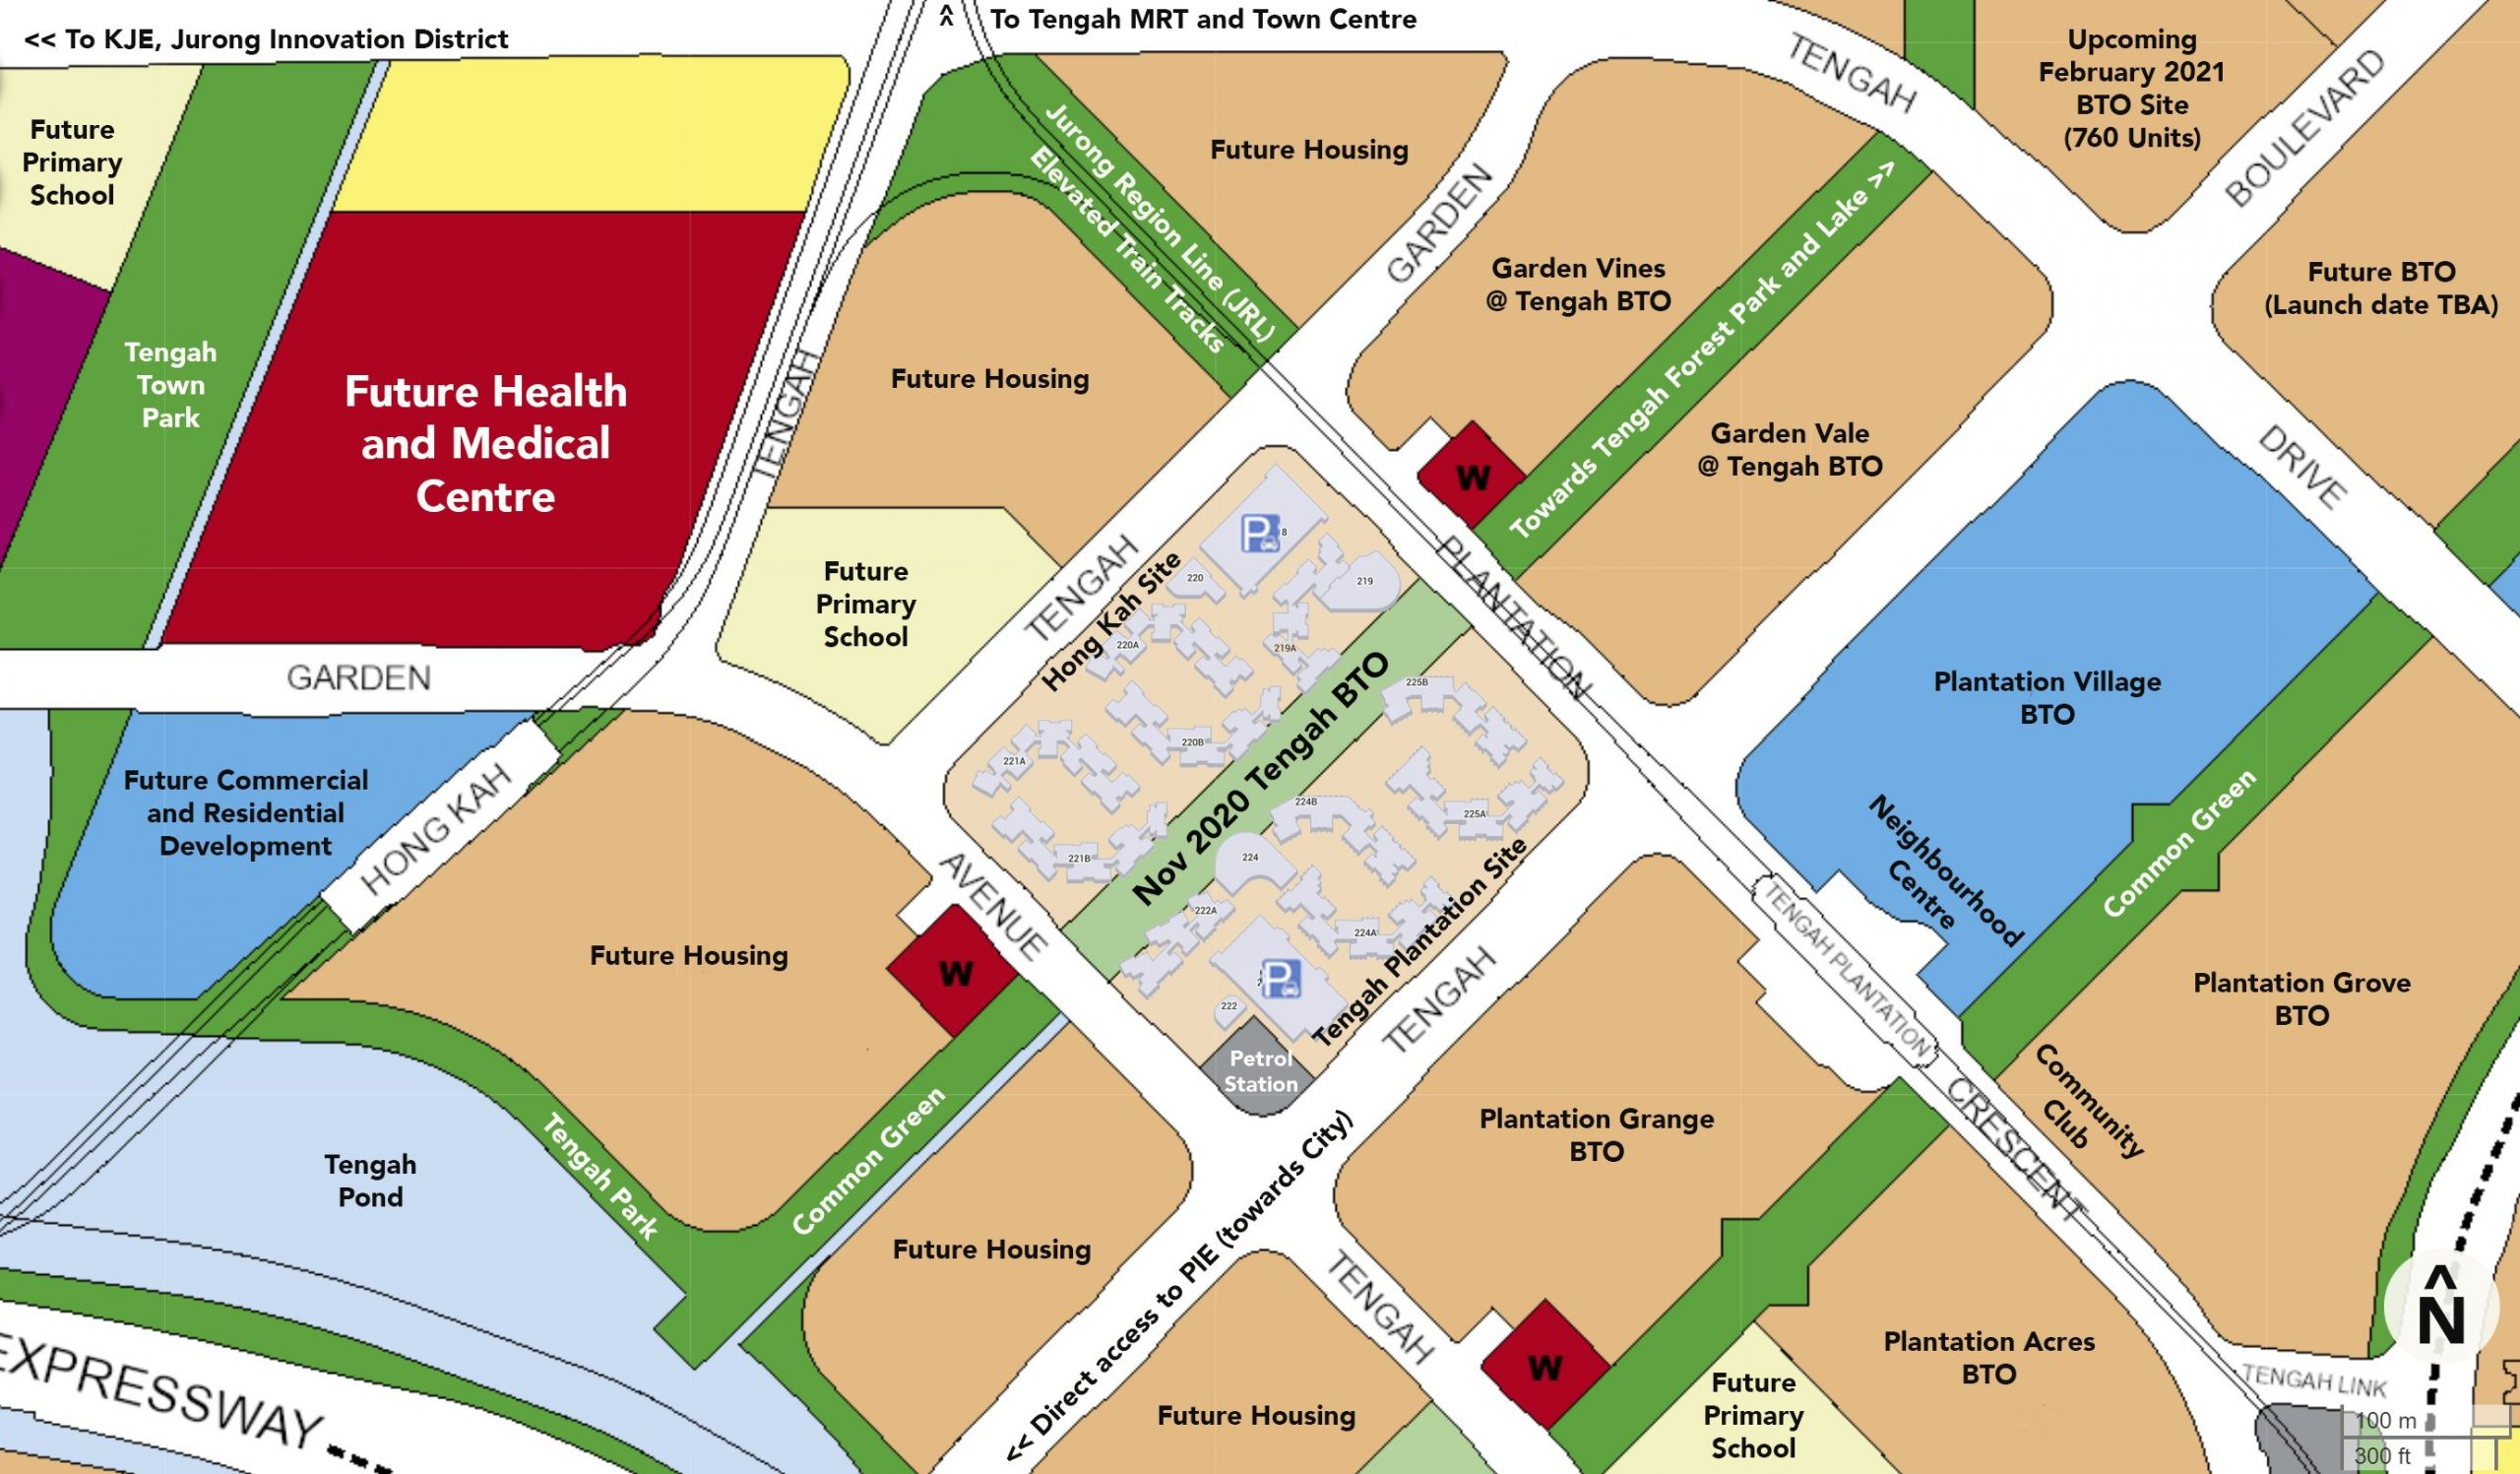 hdb nov 2020 tengah bto ura master plan map